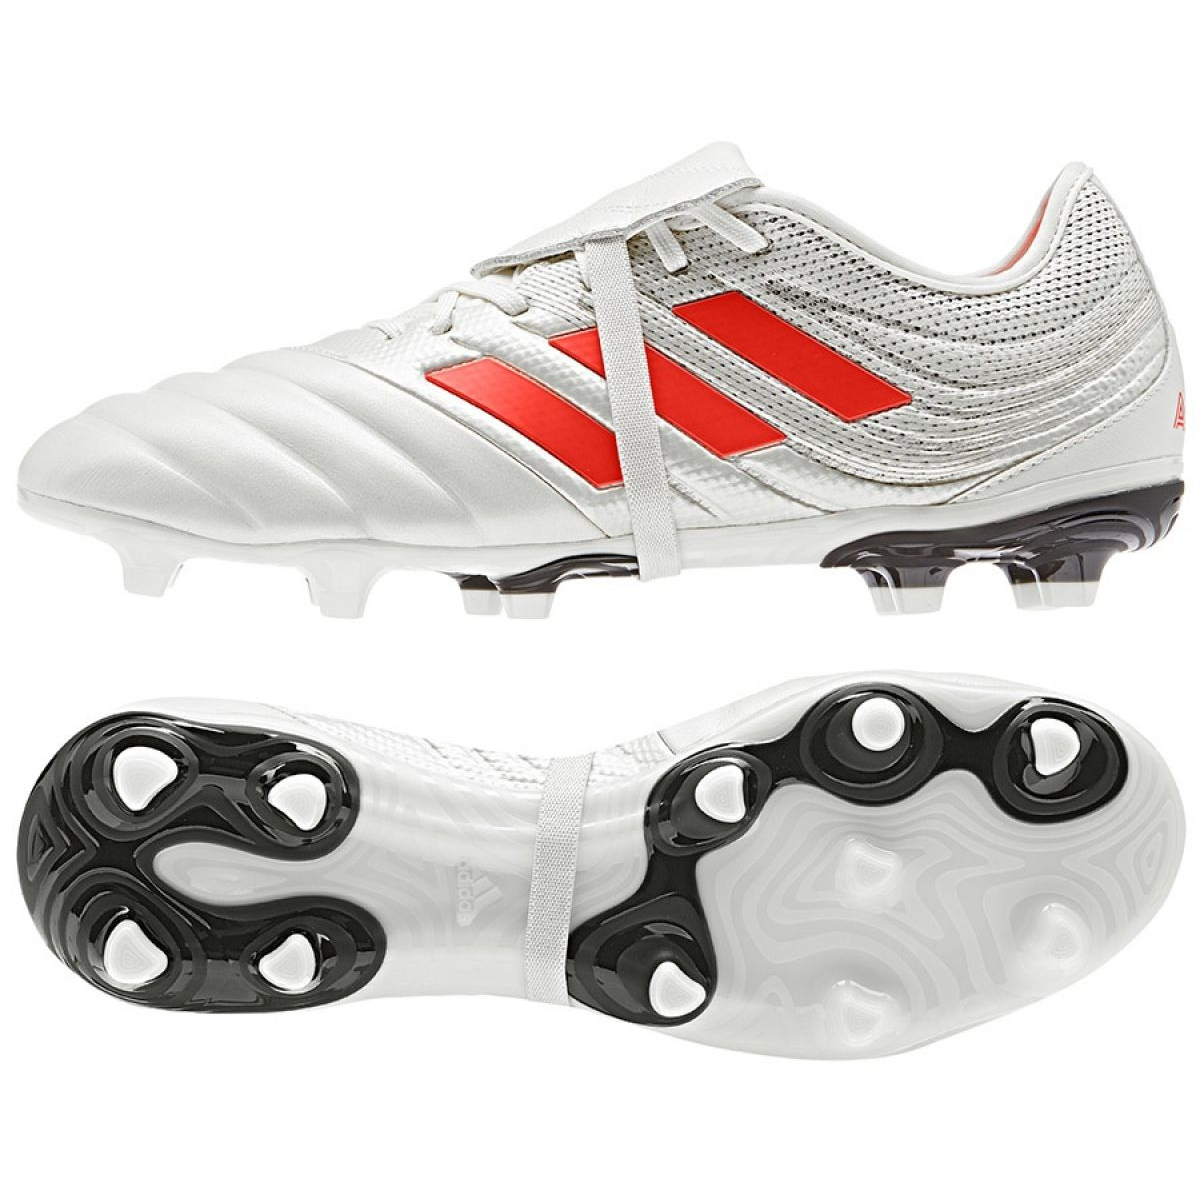 Adidas Copa Glgold 19,2 Fg M D98060 Fußballshoes